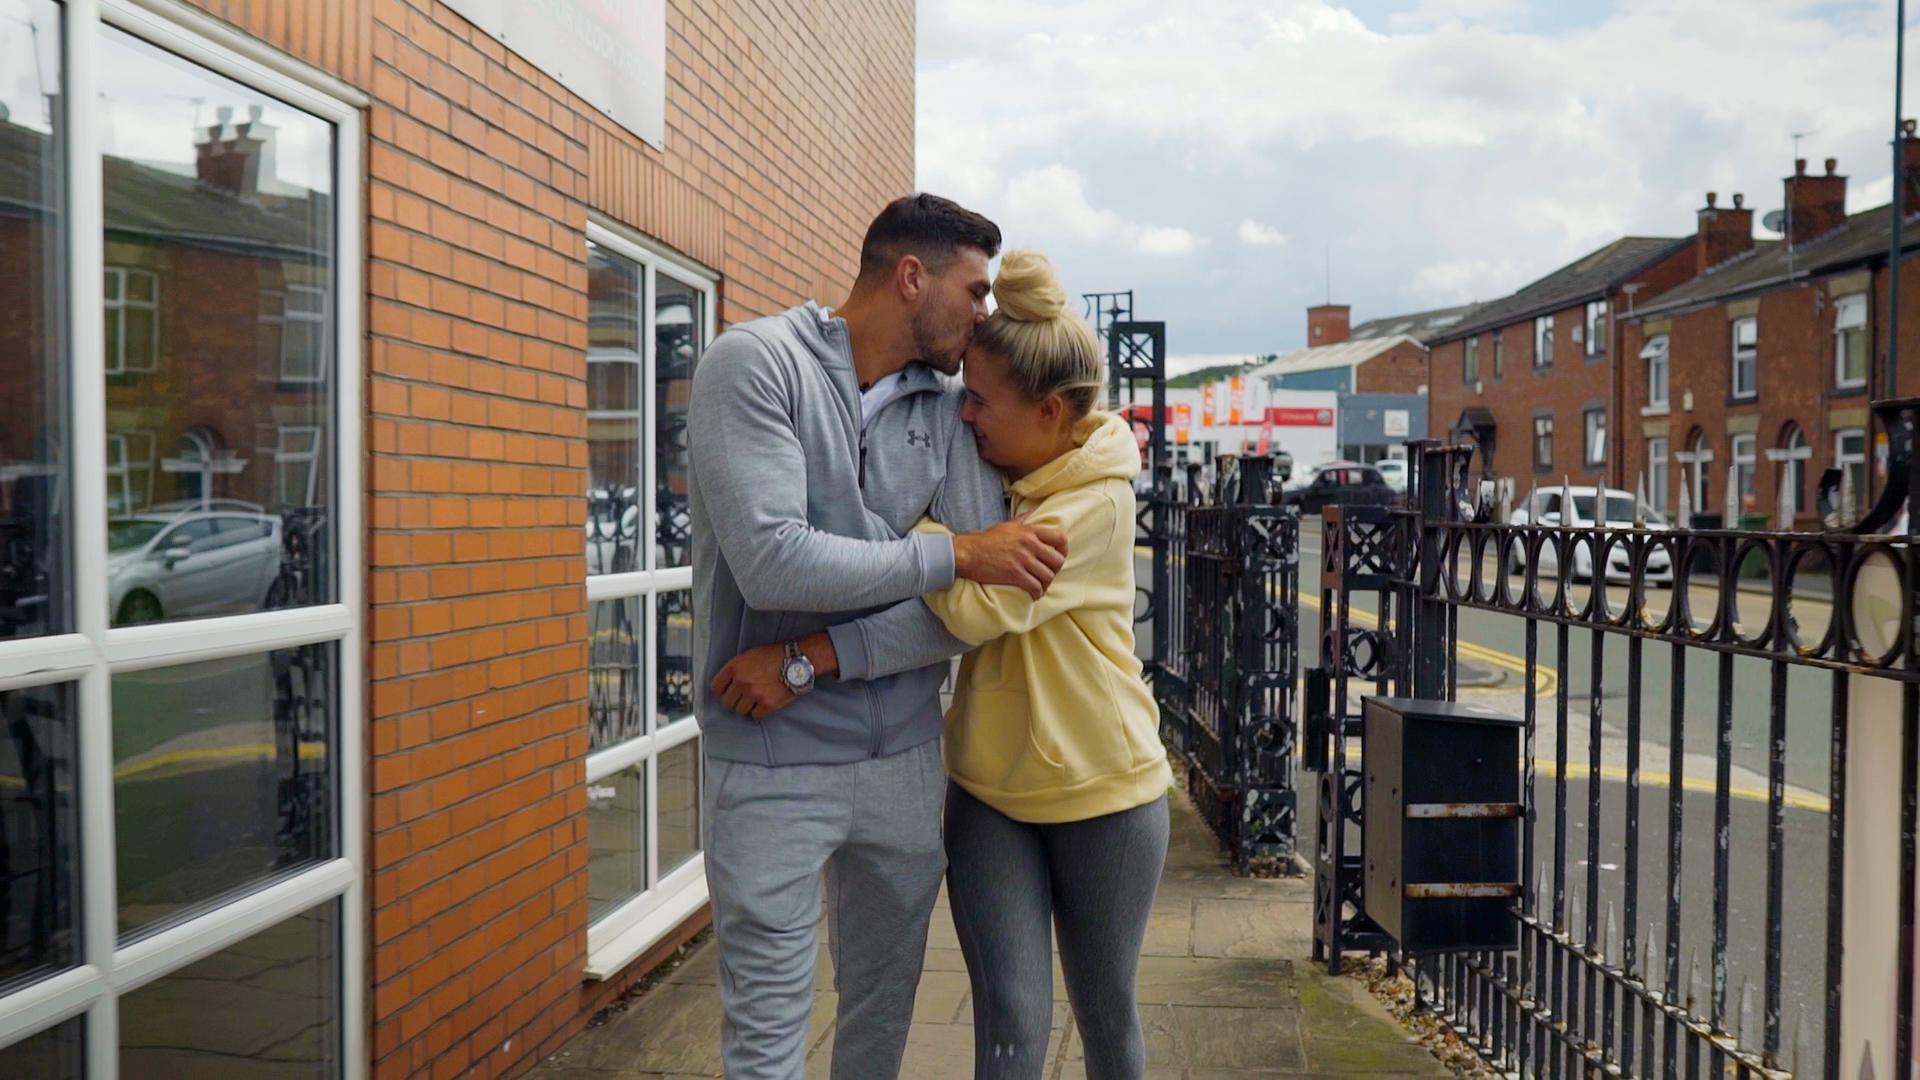 Dating forces reunited org uk basketball